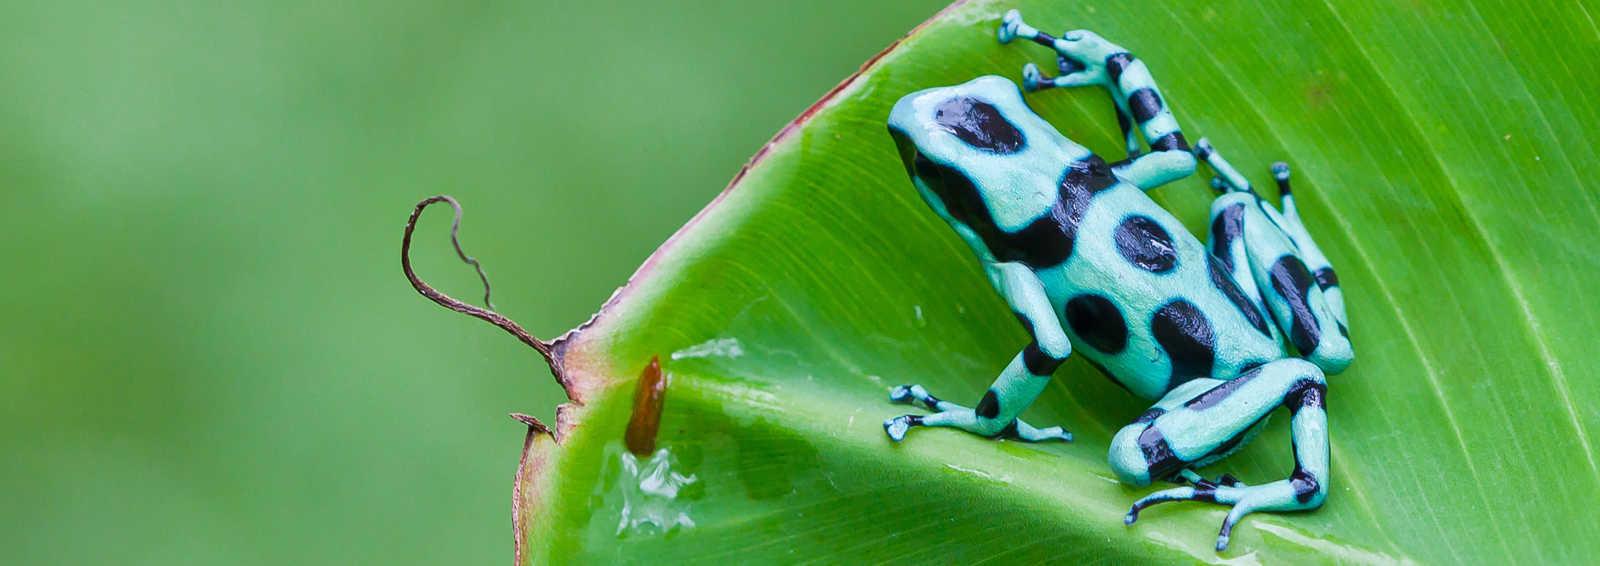 Green and Black Poison Dart Frog (Dendrobates auratus), Costa Rica